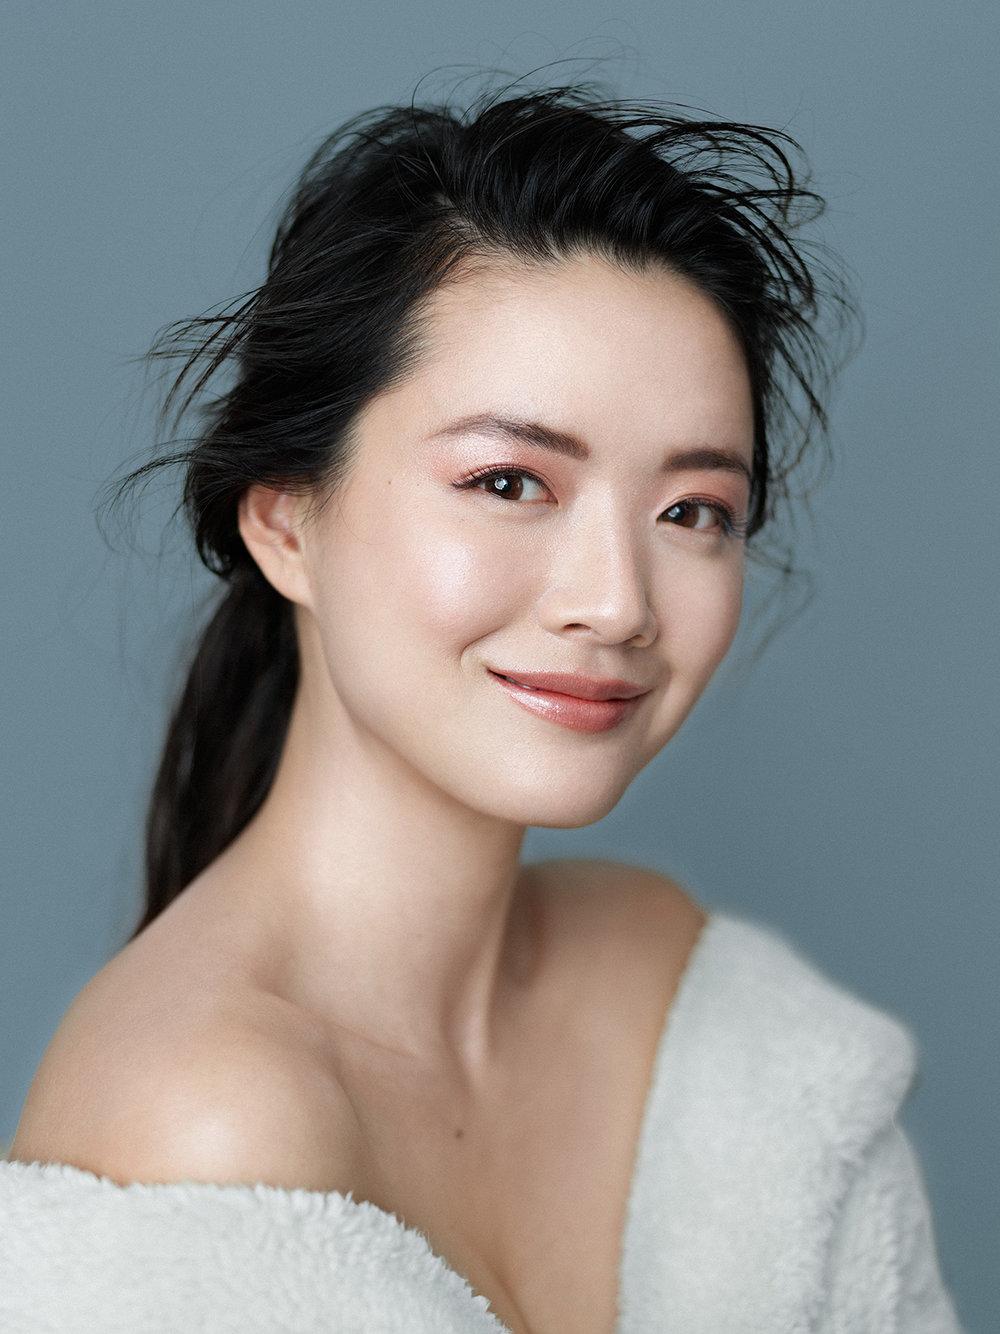 Michelle_Zhou2_0312 small.jpg